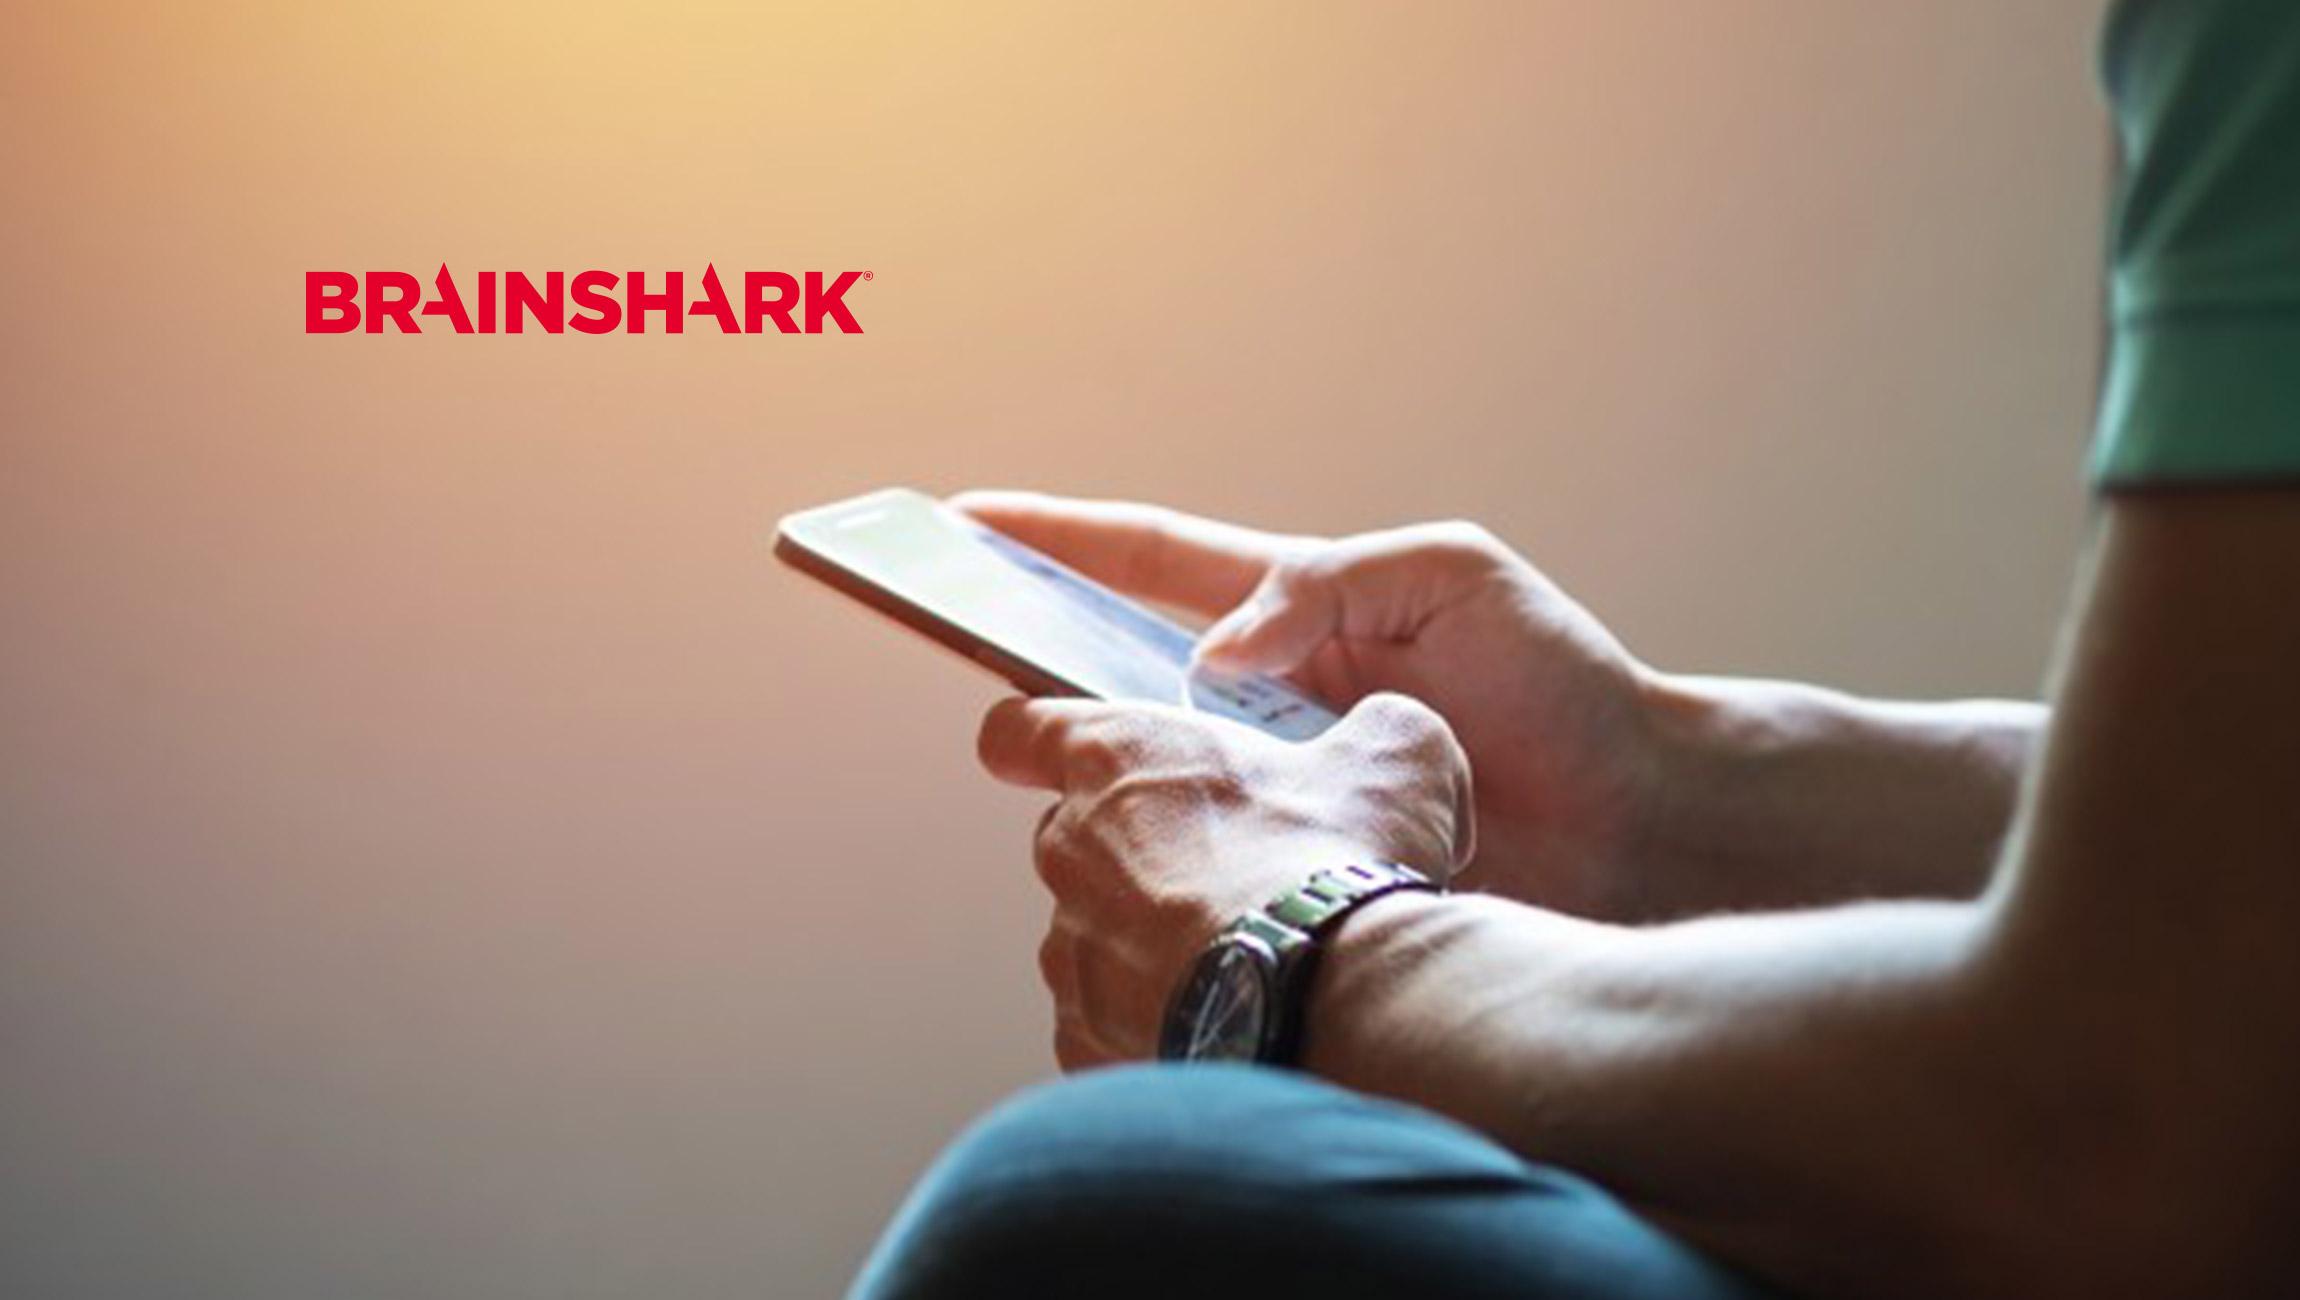 Brainshark Recognized In Gartner's Market Guide For Sales Engagement Platforms